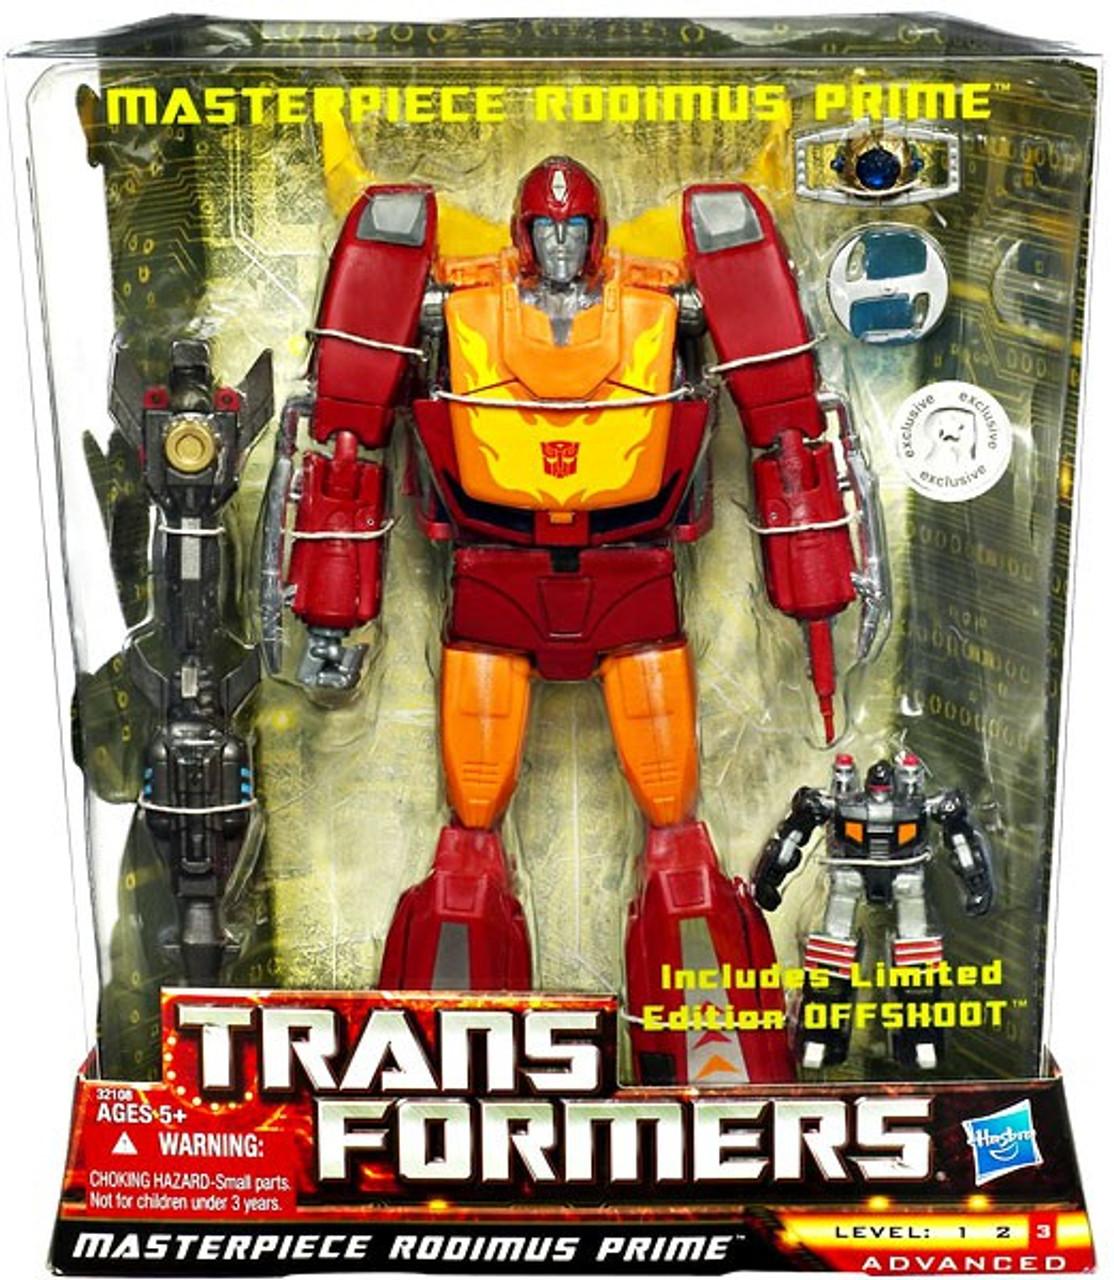 Transformers Universe Masterpiece Rodimus Prime Exclusive Deluxe Action Figure